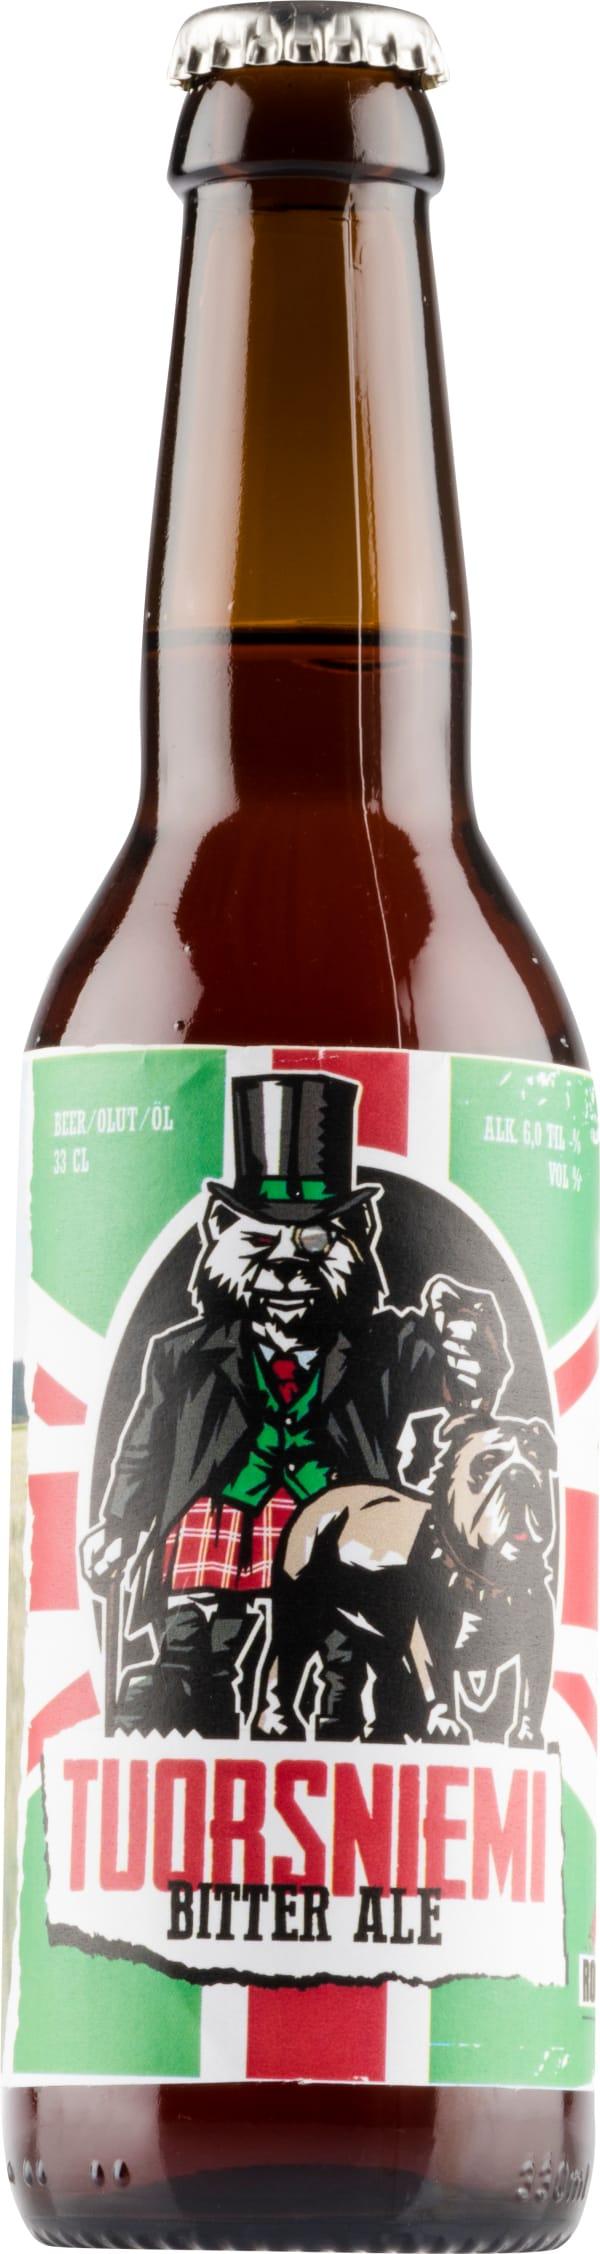 Rocking Bear Tuorsniemi Bitter Ale